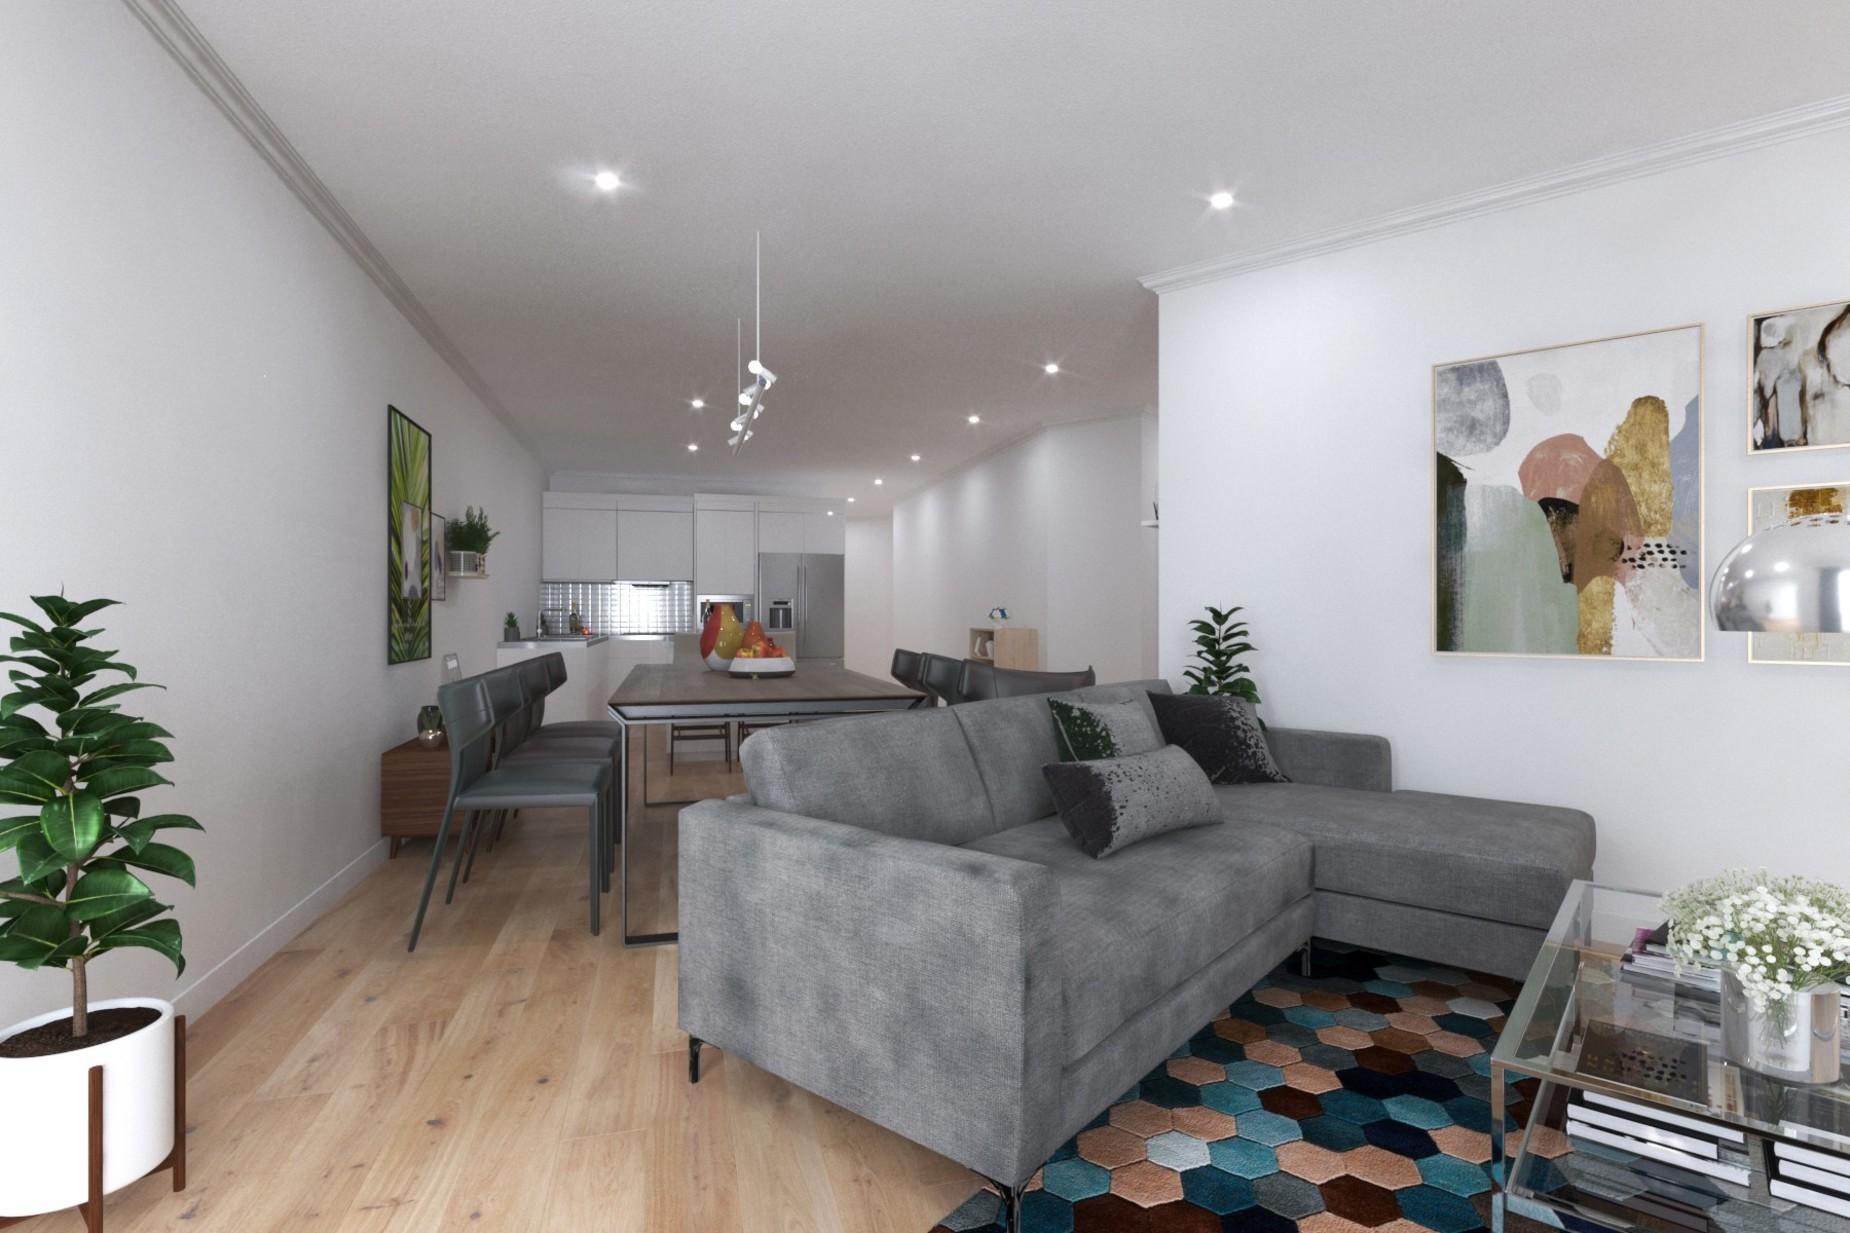 3 bed Apartment For Sale in Birkirkara, Birkirkara - thumb 2